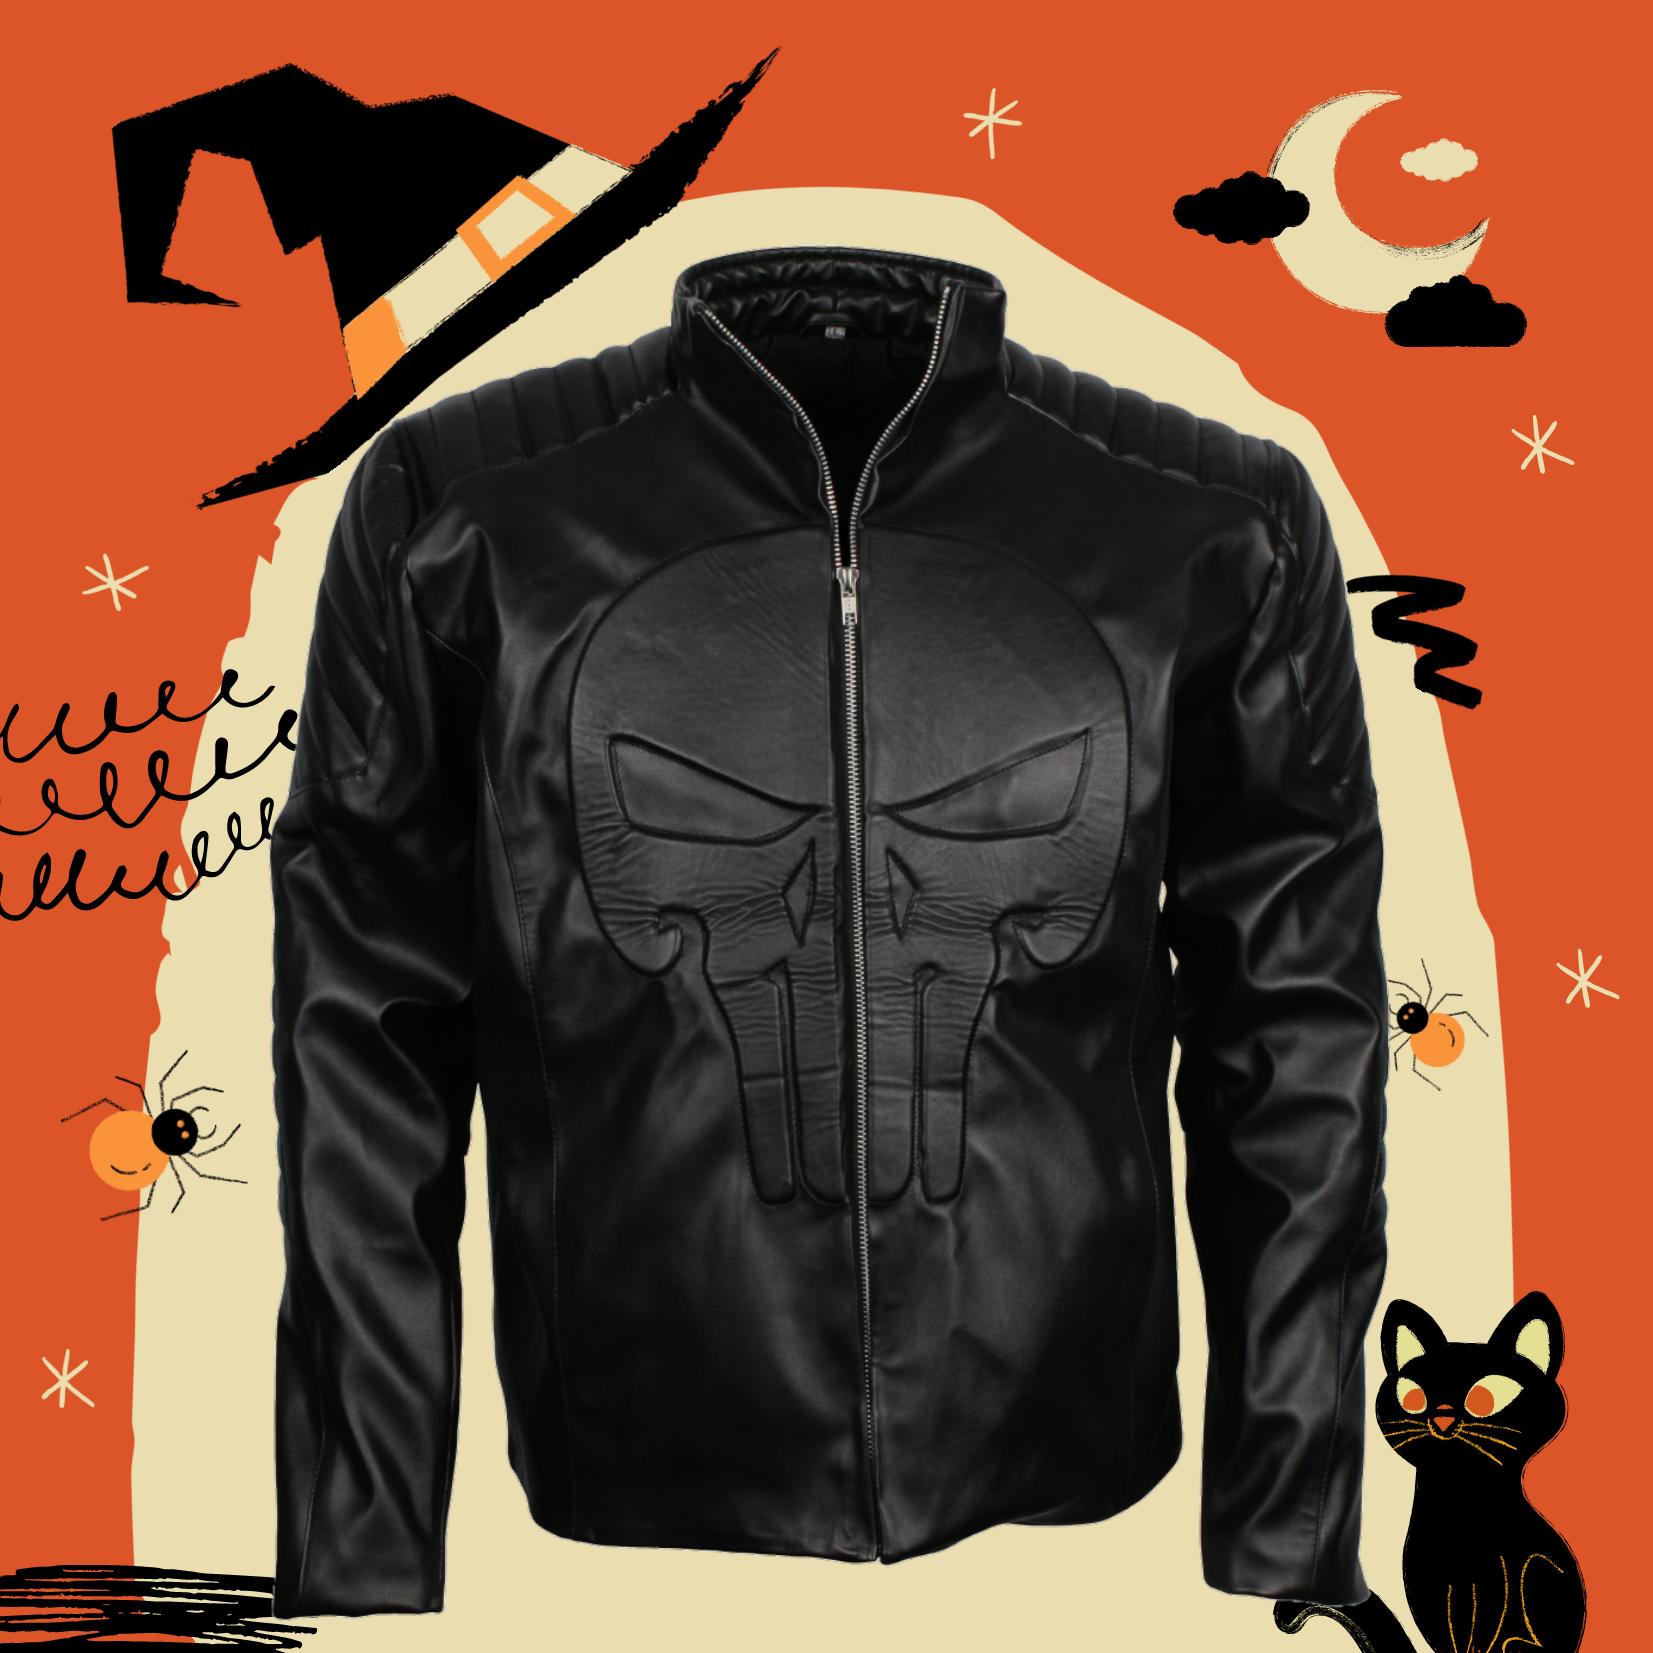 Punisher Men S Black Faux Leather Jacket Us Leather Mart In 2020 Black Faux Leather Jacket Faux Leather Jackets Jackets [ 1653 x 1653 Pixel ]